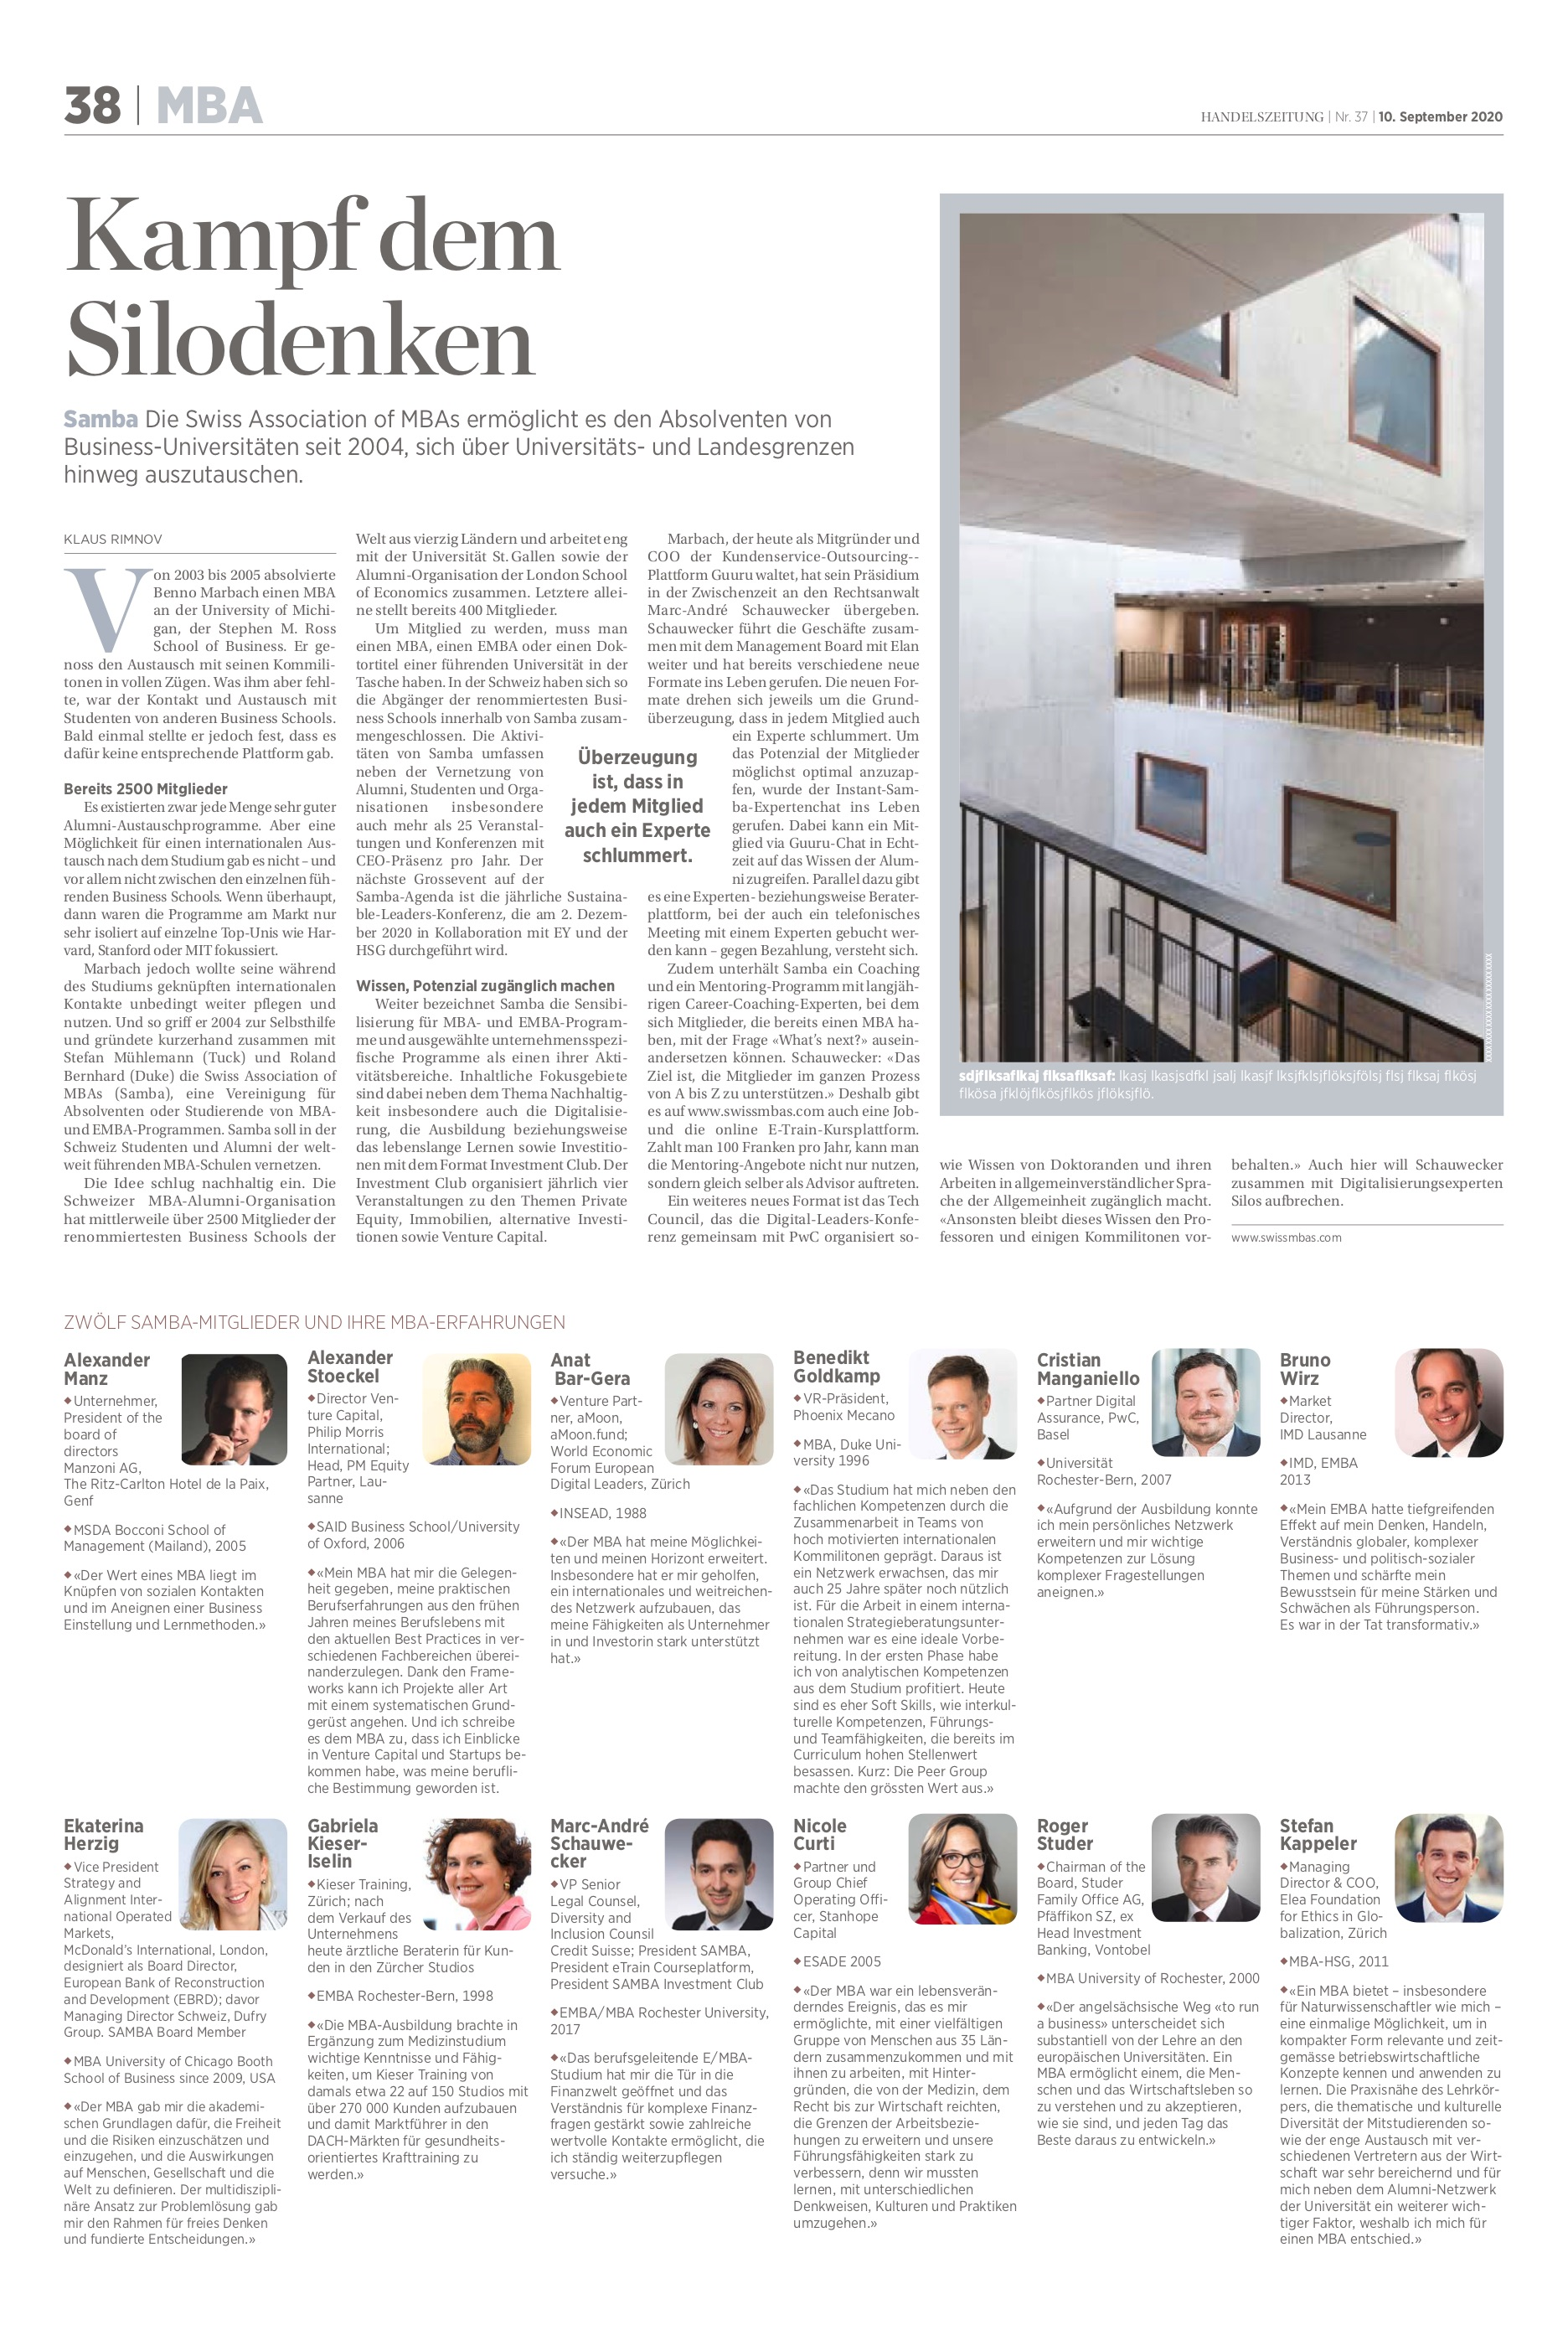 Fight the silo thinking - Kampf dem Silodenken